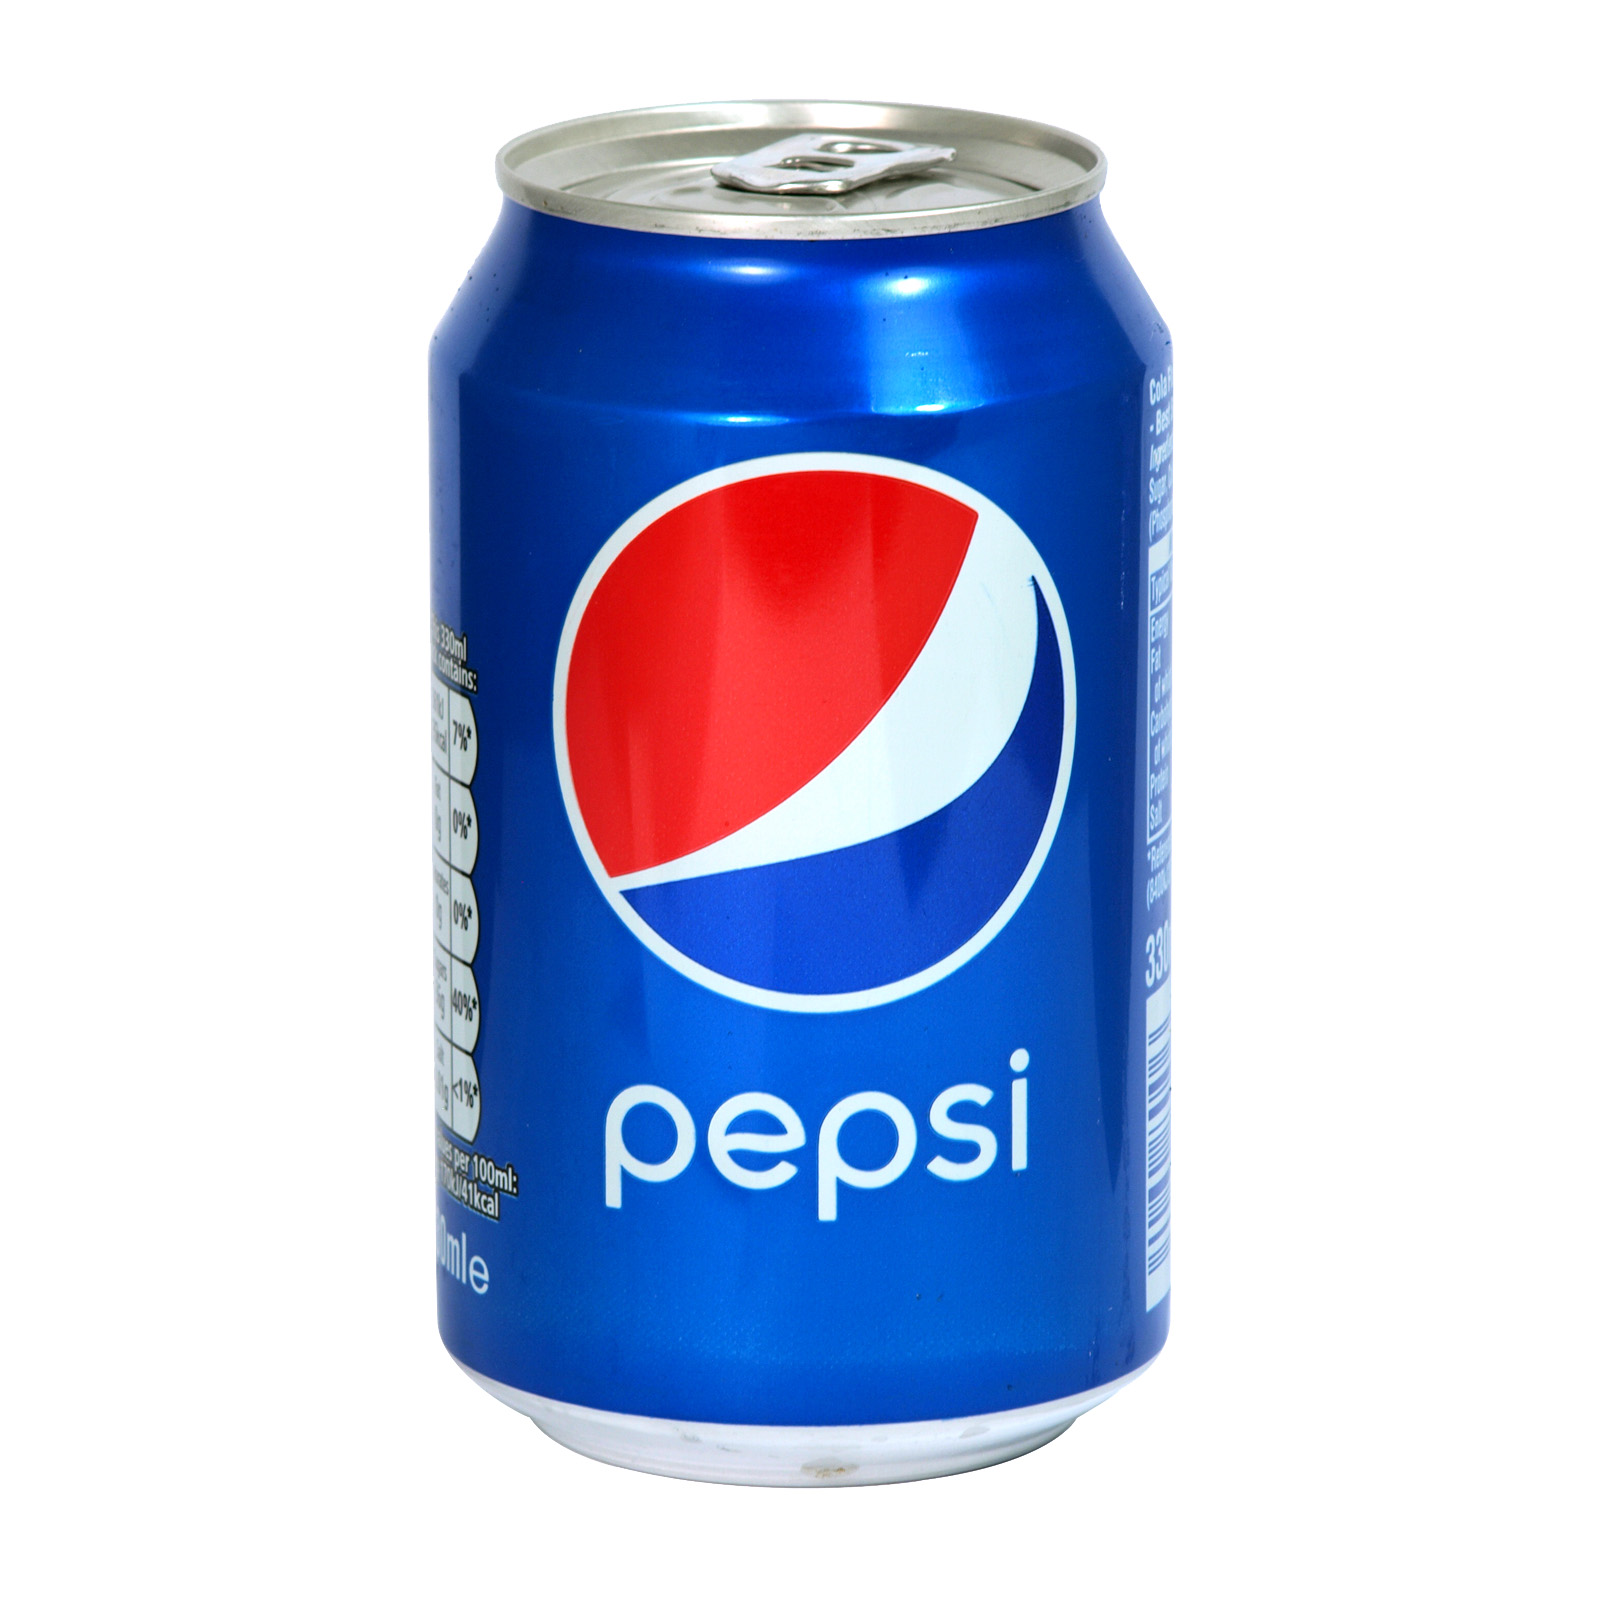 PEPSI 330ML CANS REGULAR X24